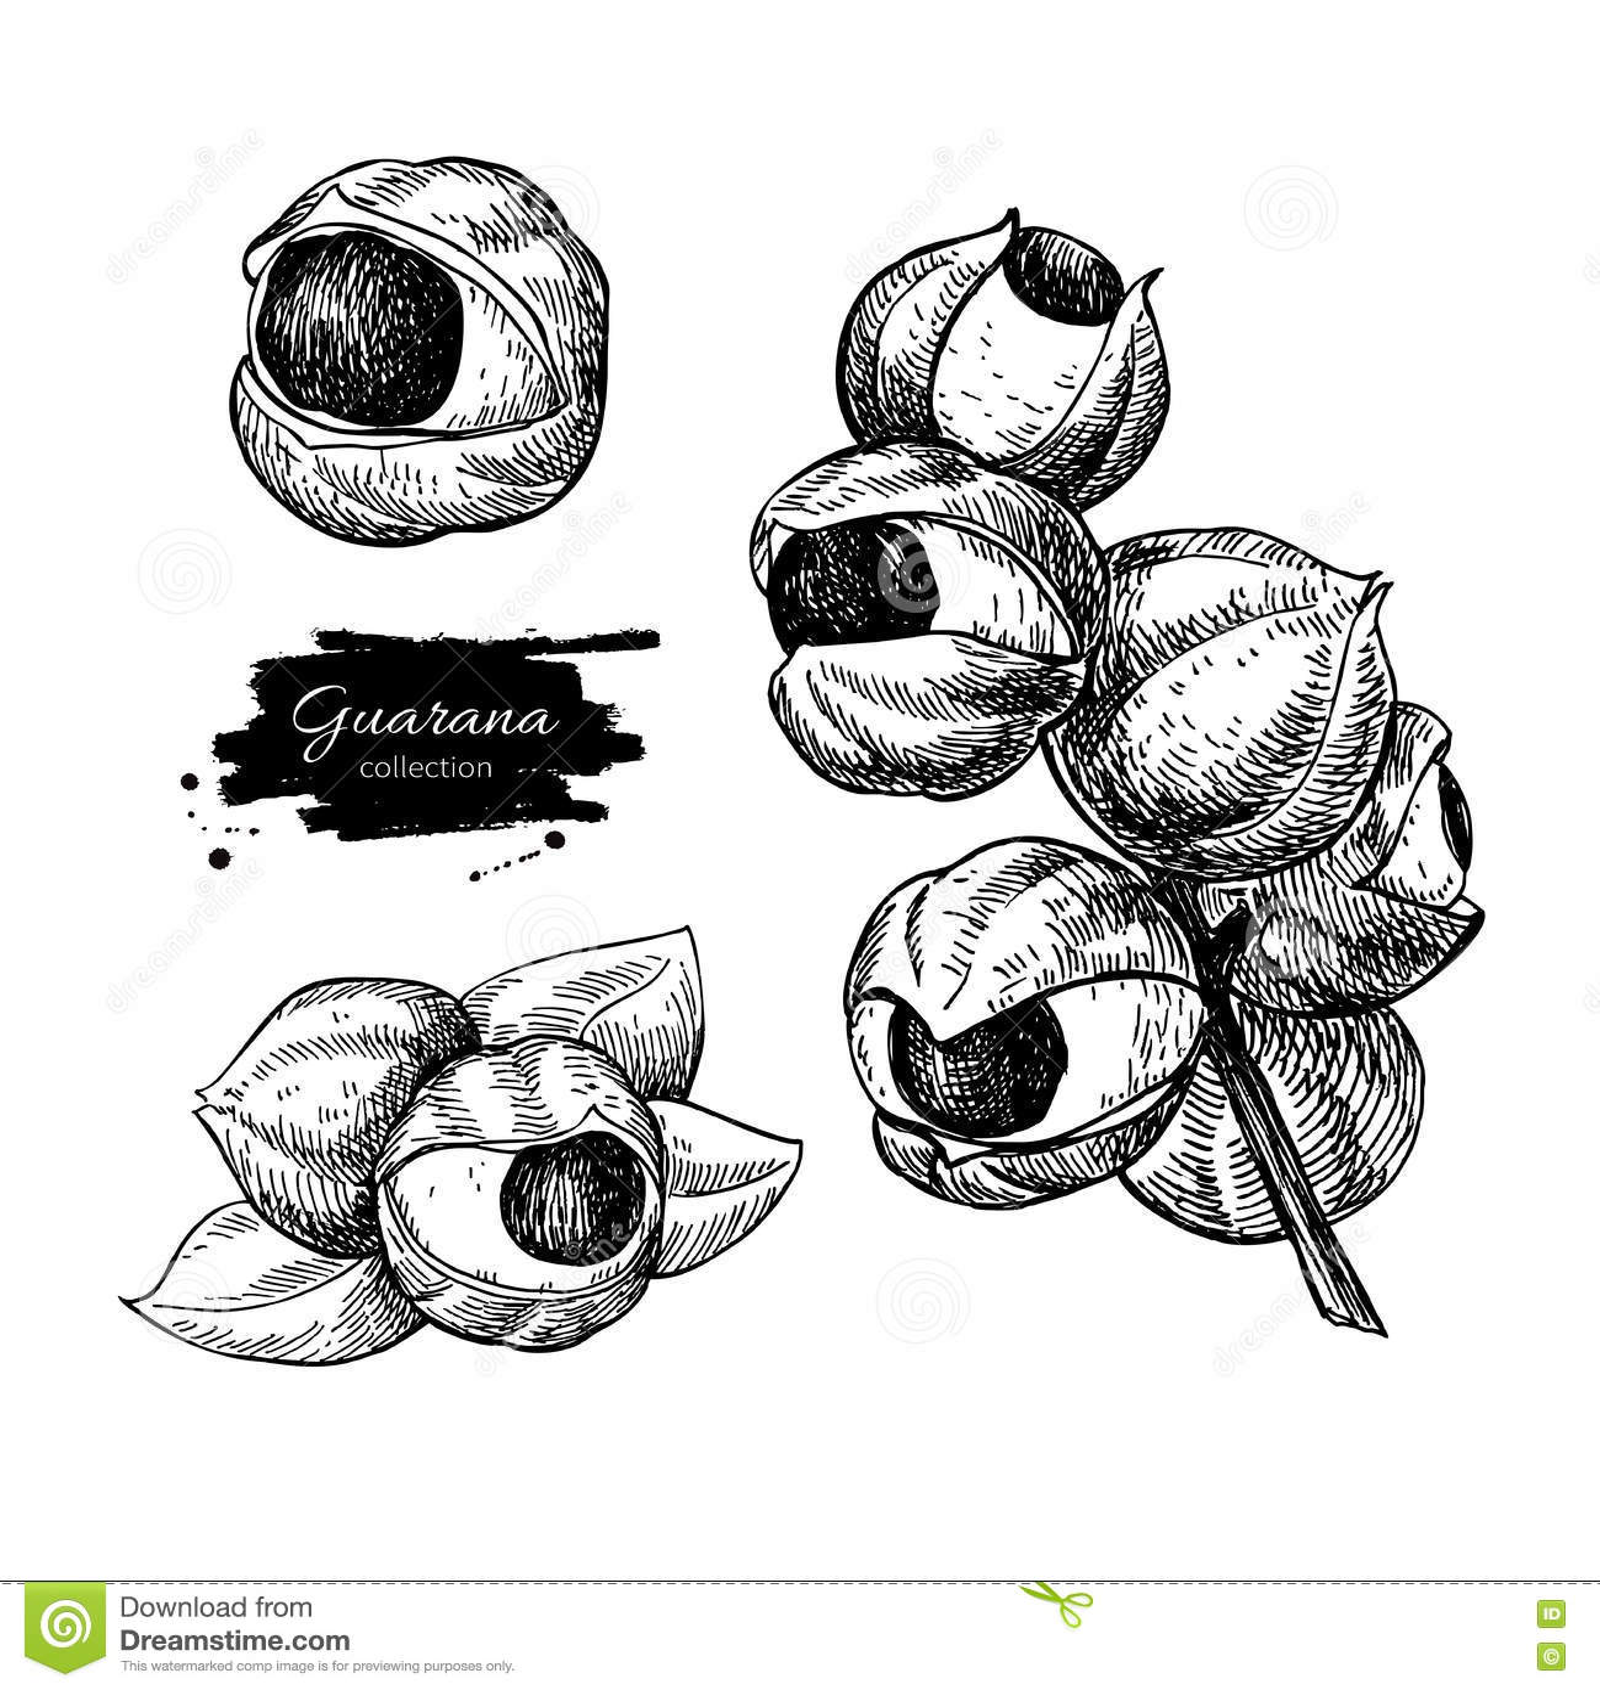 Guarana vector superfood drawing set. Isolated hand drawn